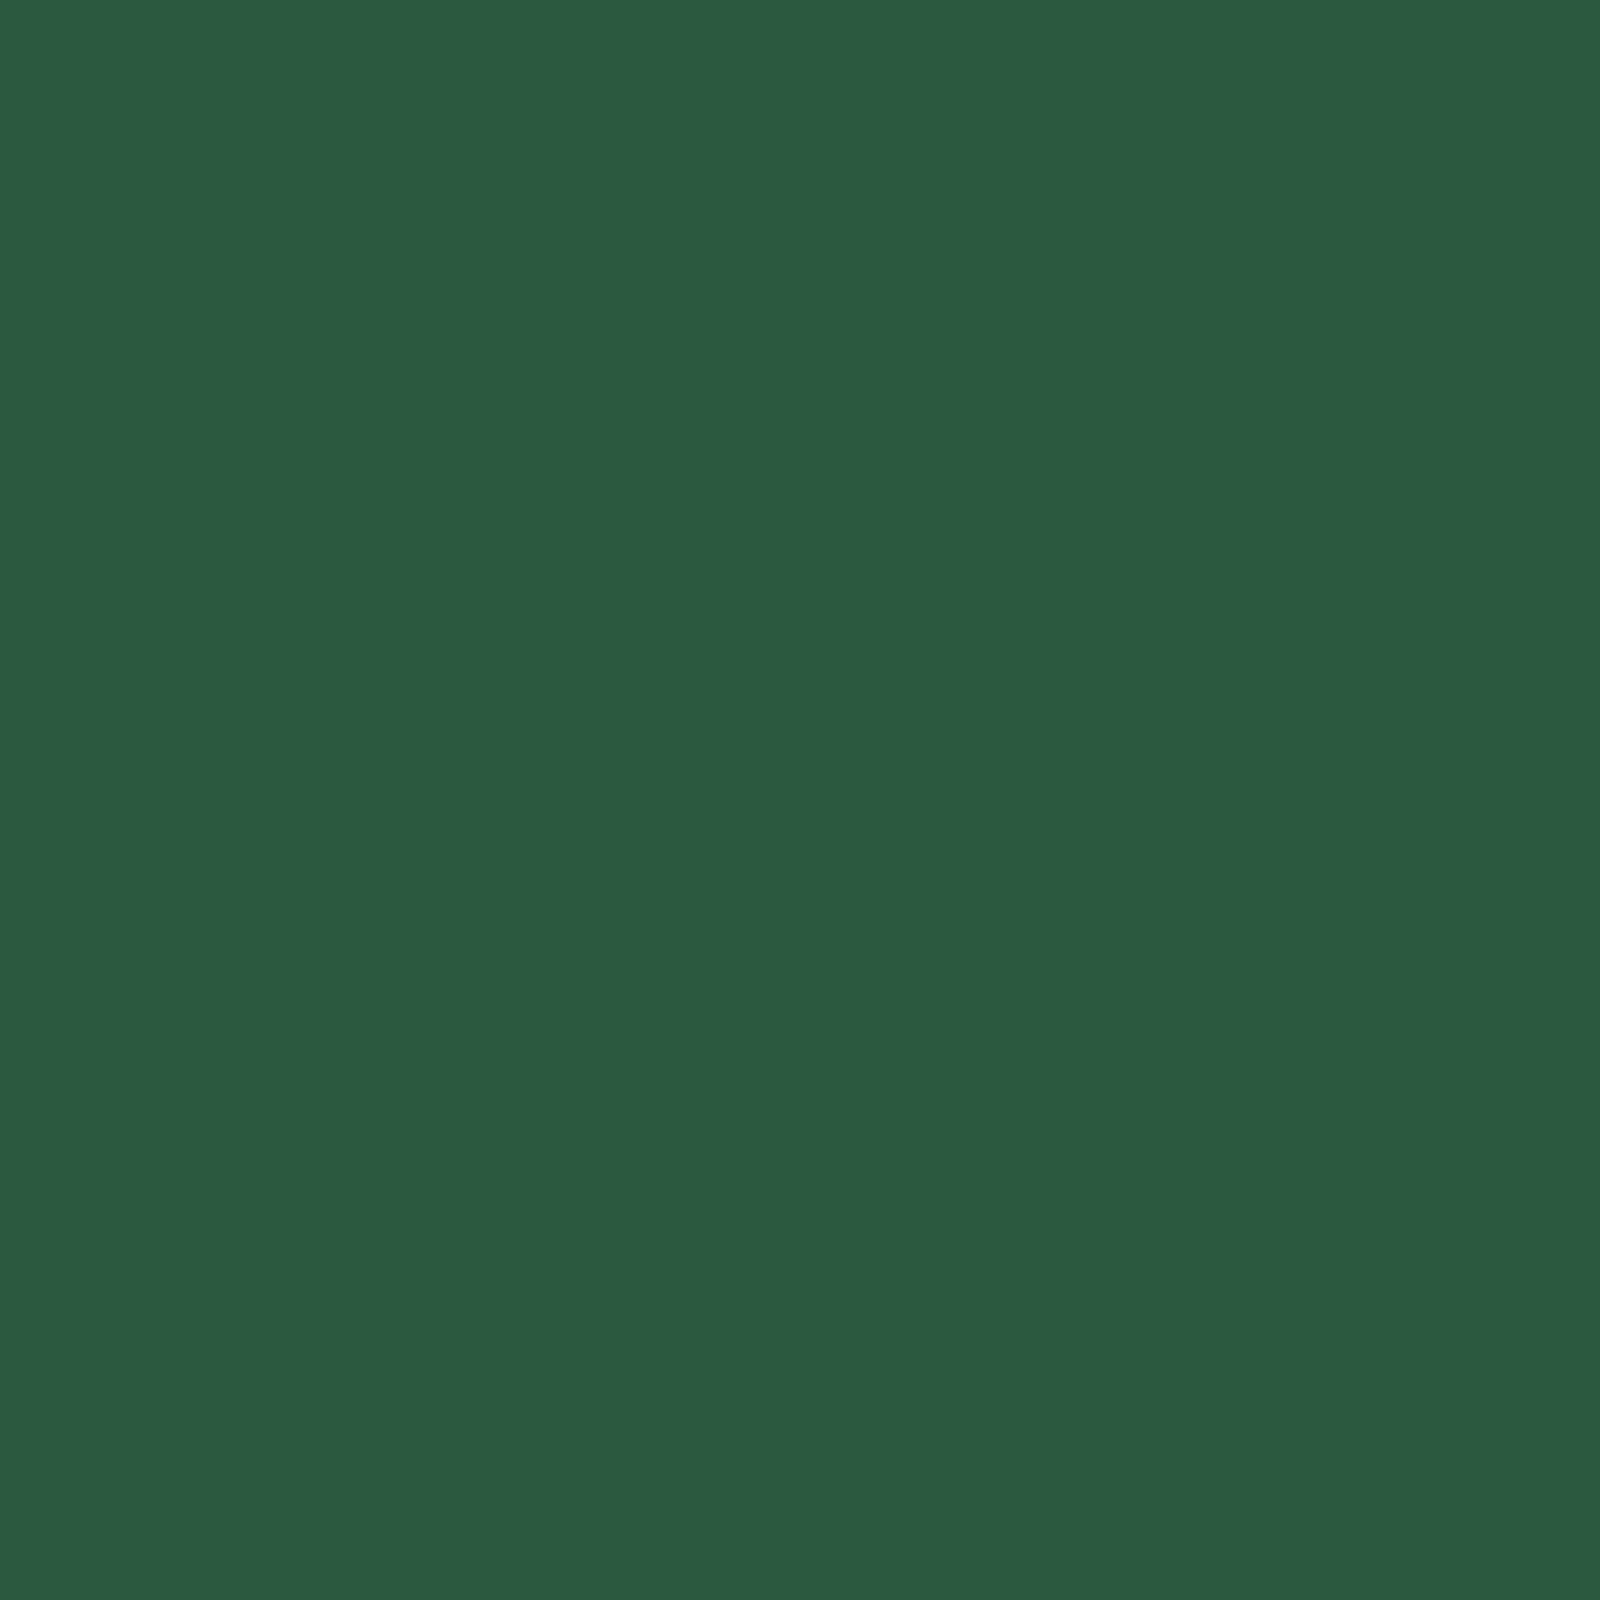 kobra verde Michelangelo